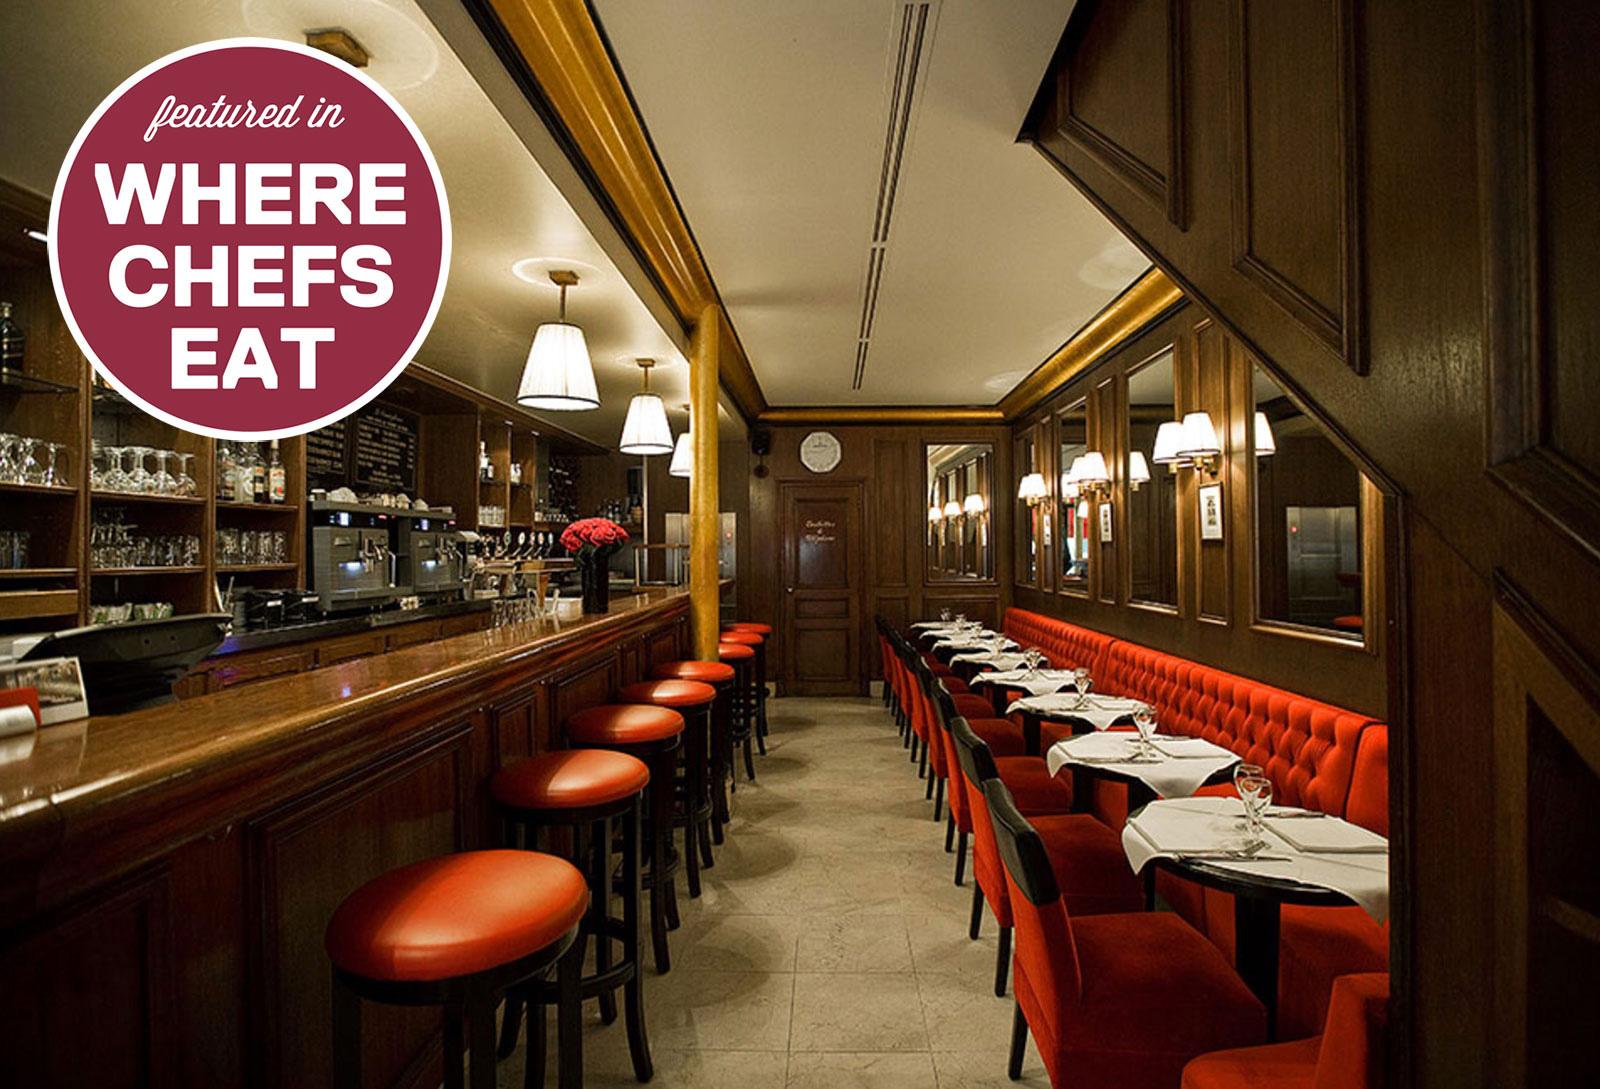 Le Castiglione - recommended in Where Chefs Eat